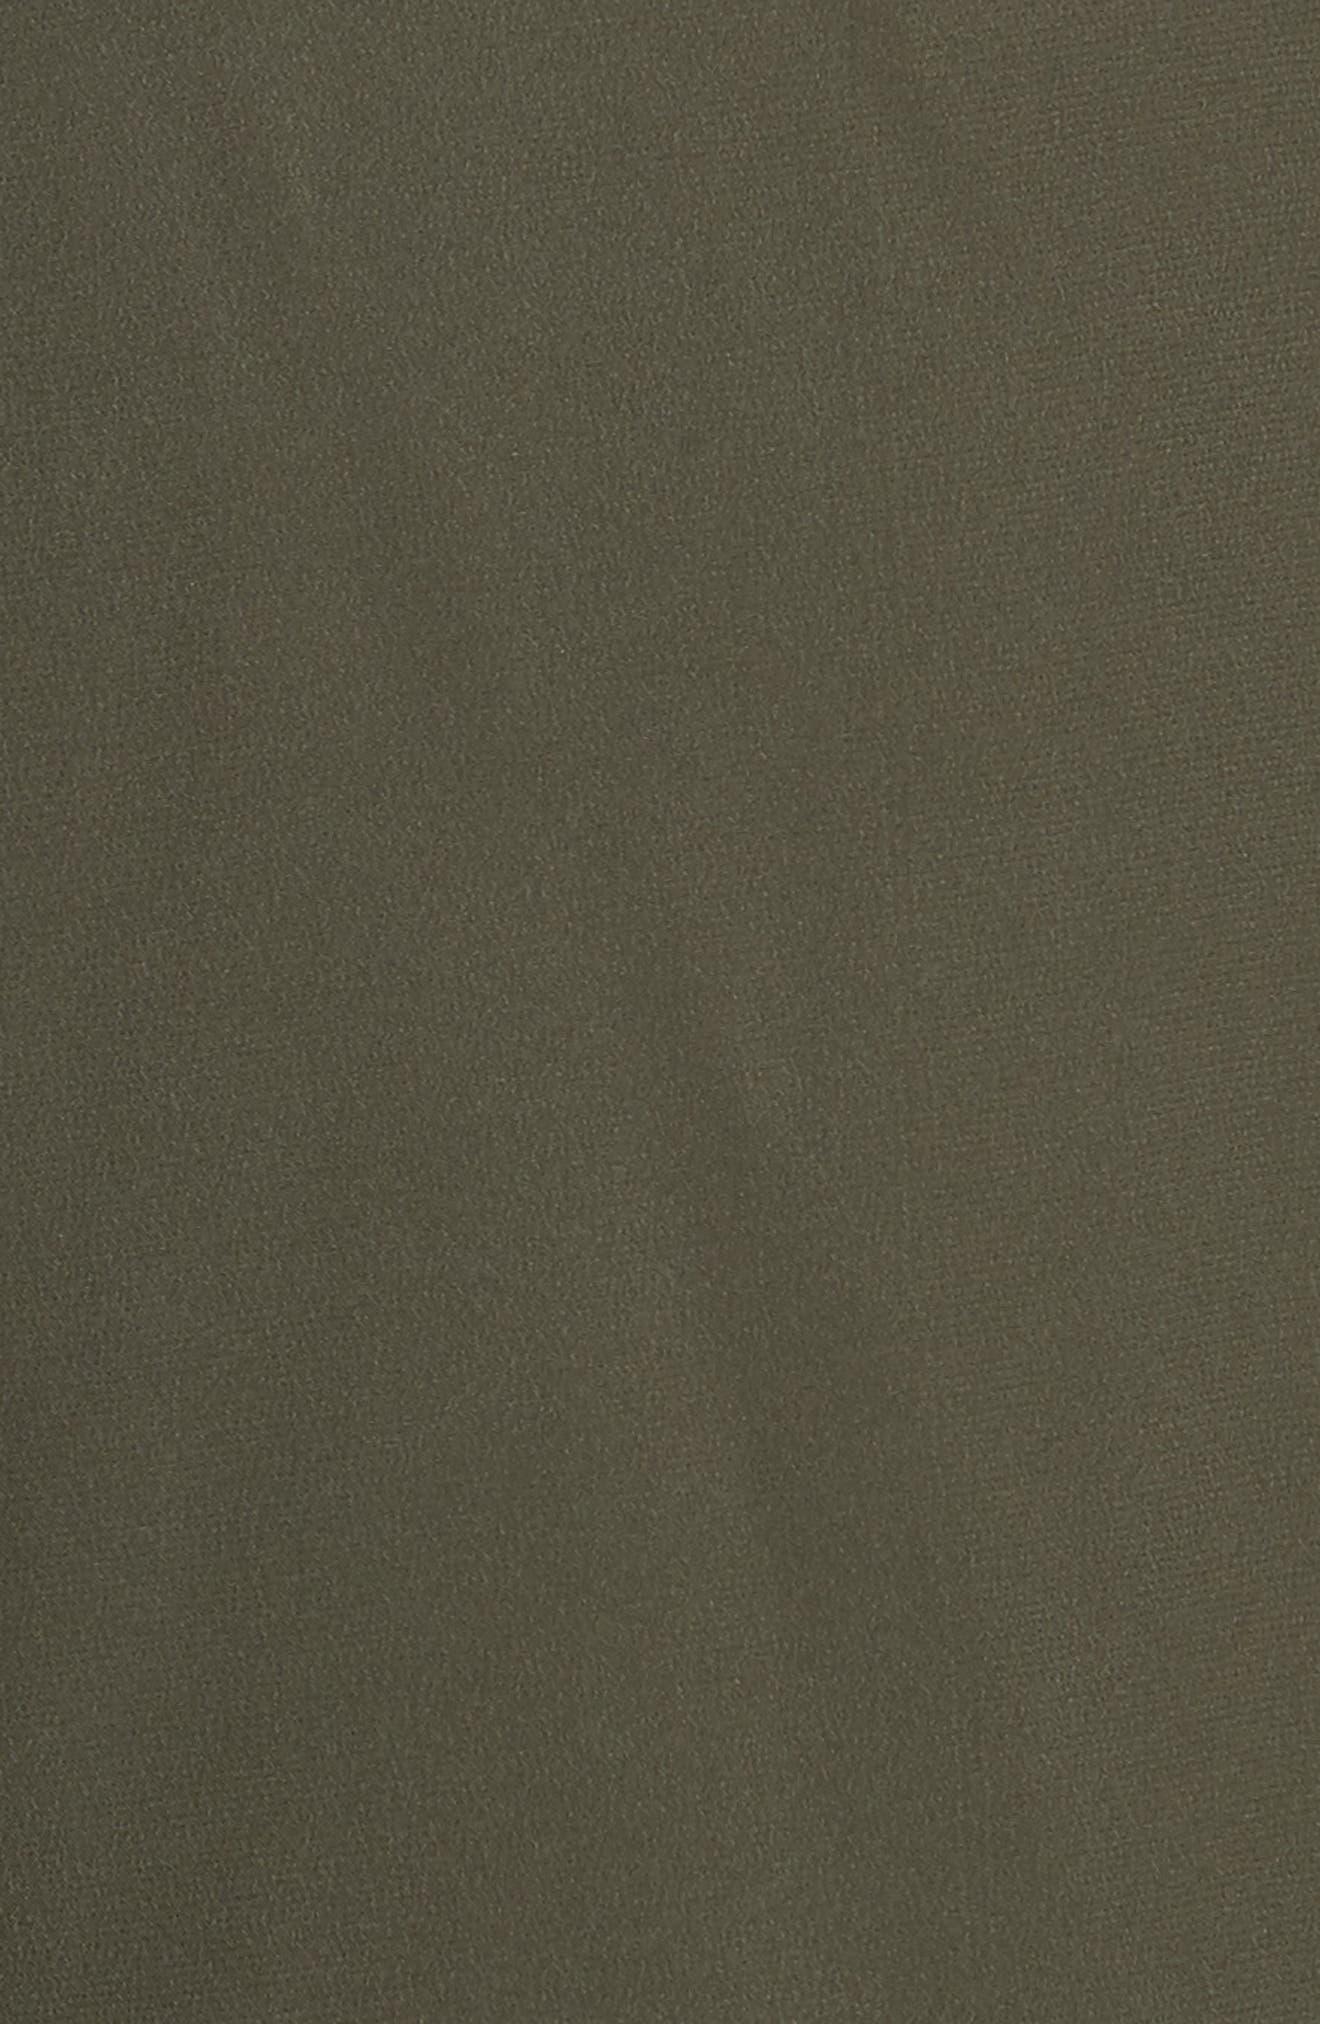 Samira Paperbag Wide Leg Pants,                             Alternate thumbnail 5, color,                             300